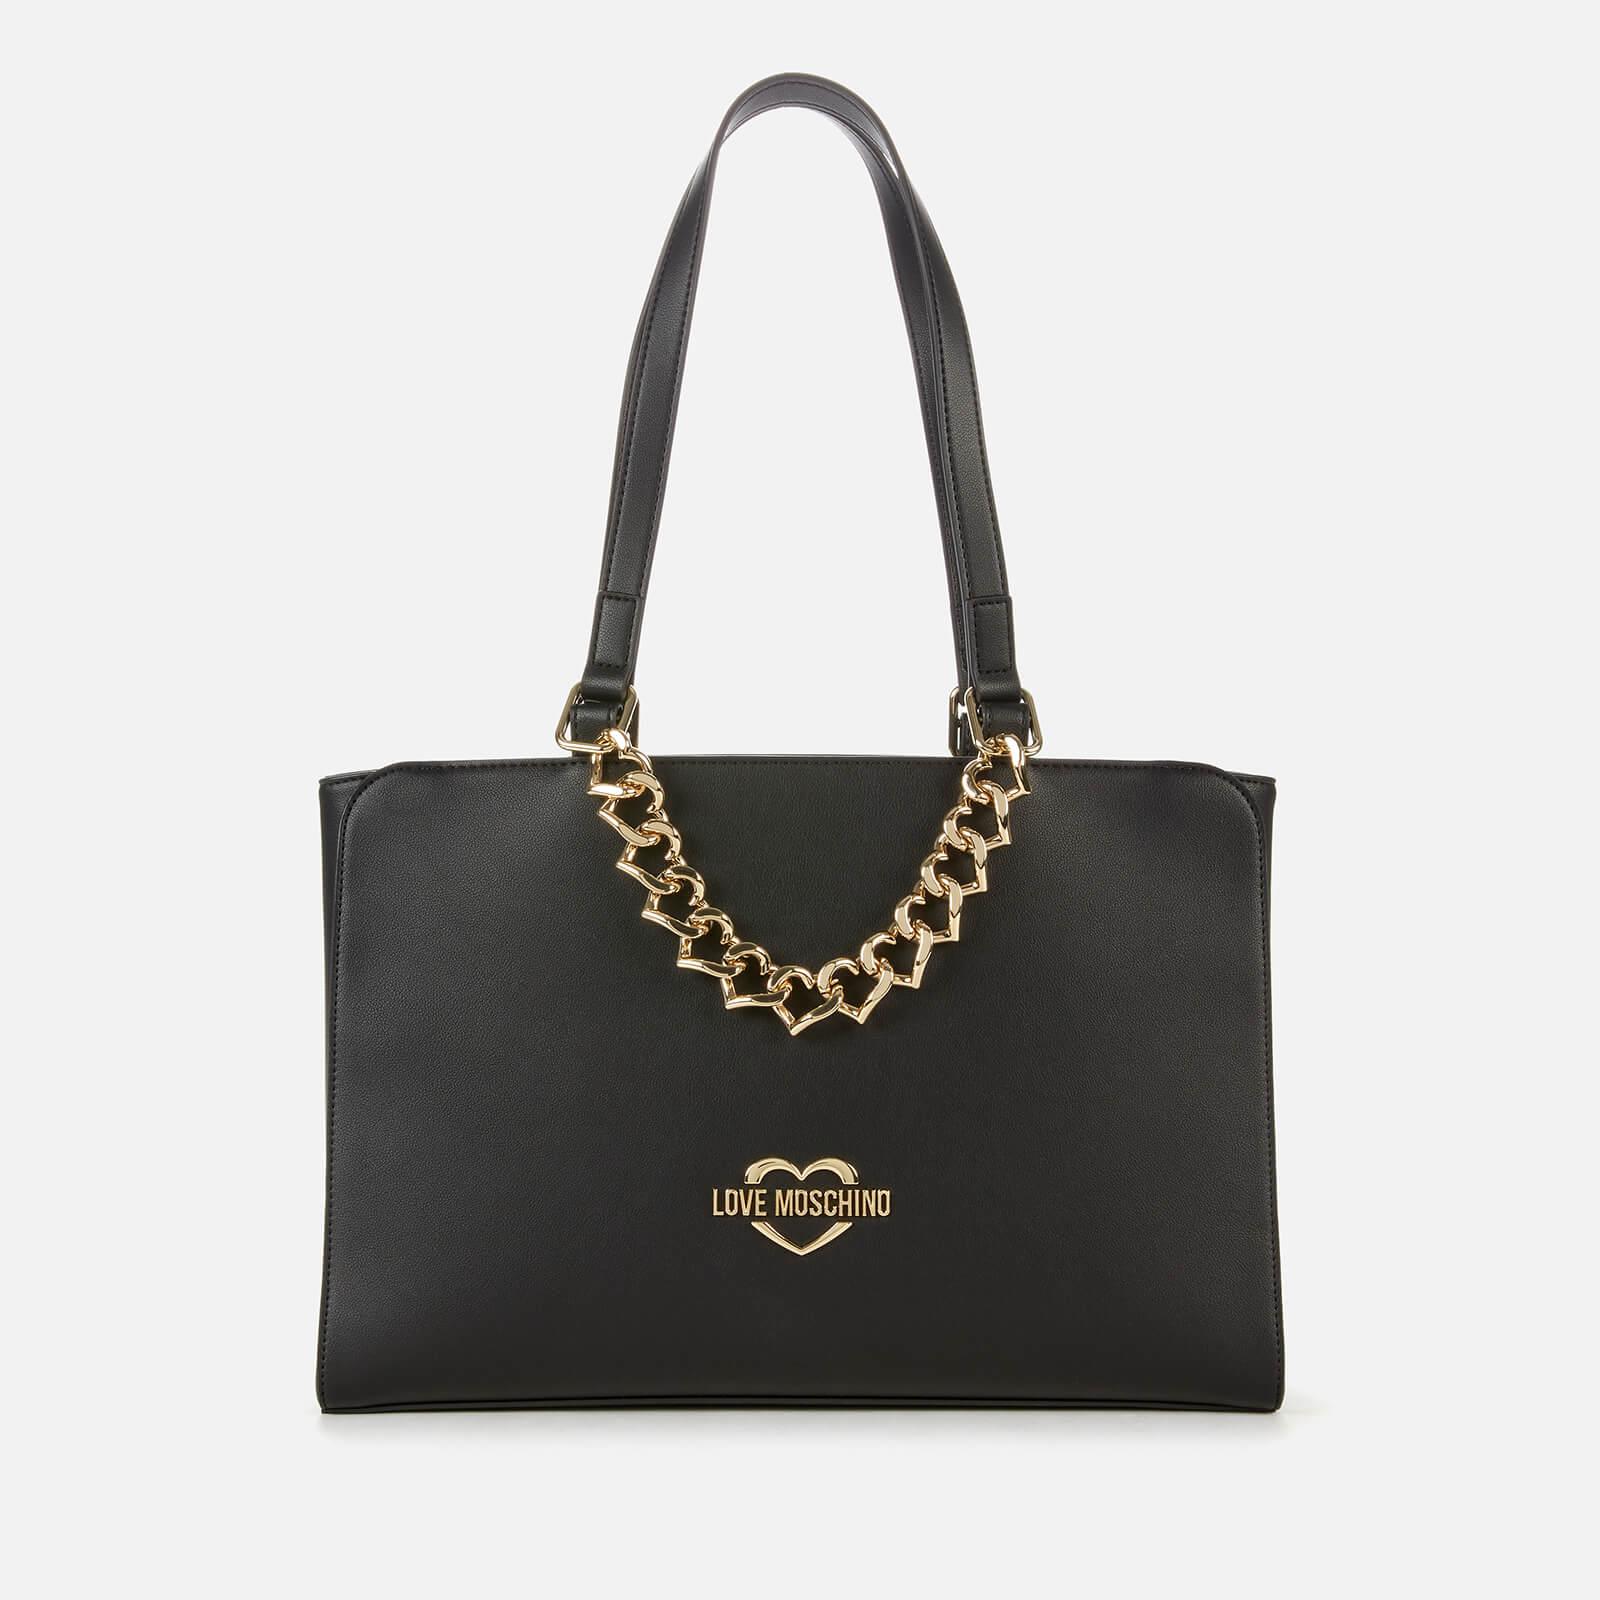 Love Moschino Women's Chain Tote Bag - Black